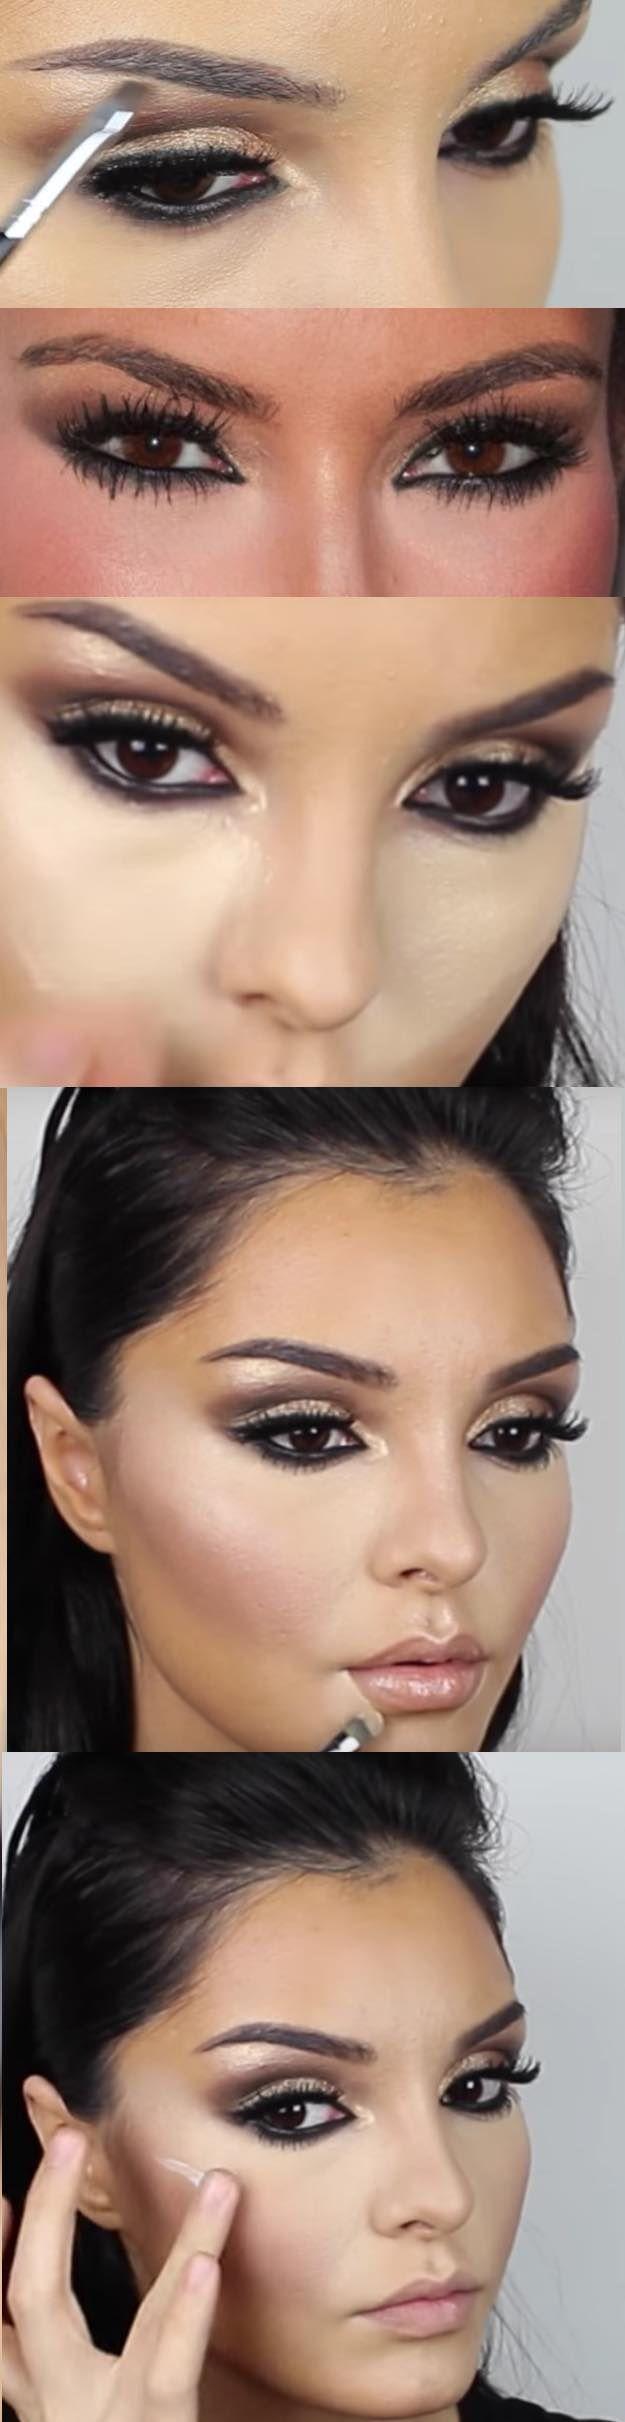 31 Makeup Tutorials for Brown Eyes - Kim Kardashian Makeup Tutorial